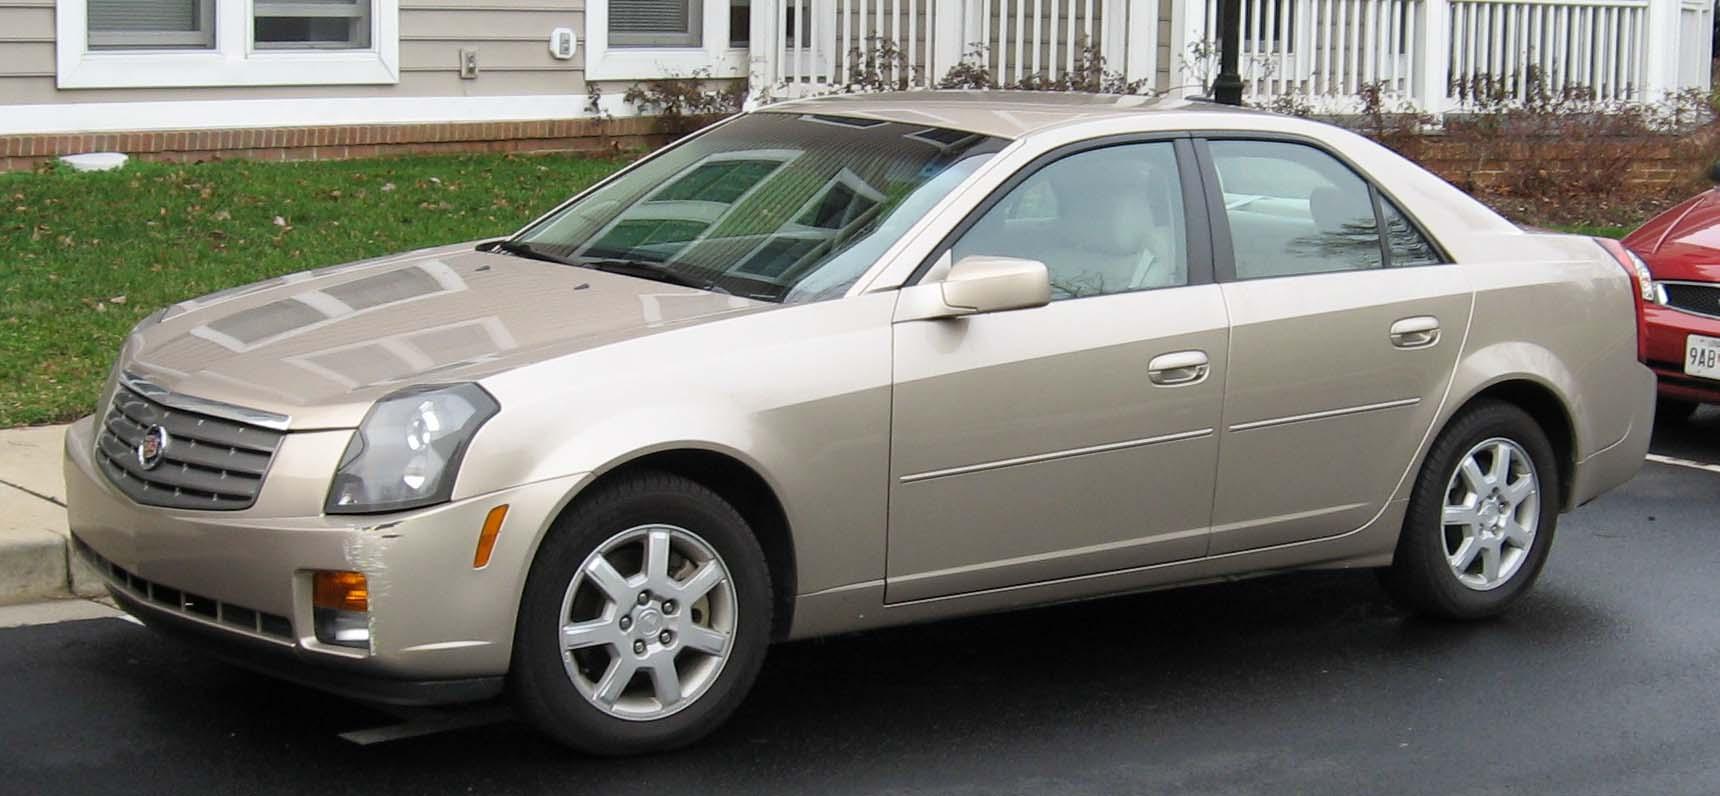 File 03 07 Cadillac Cts Jpg Wikipedia